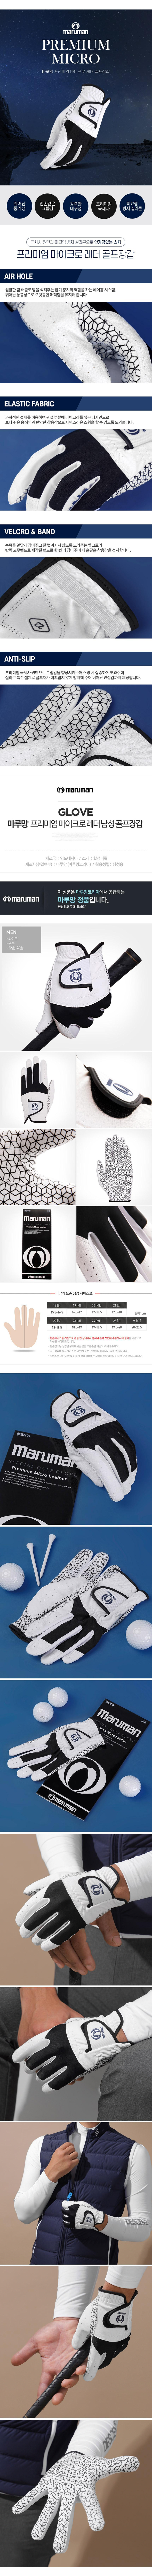 maruman_premium_micro_reder_glove_19.jpg